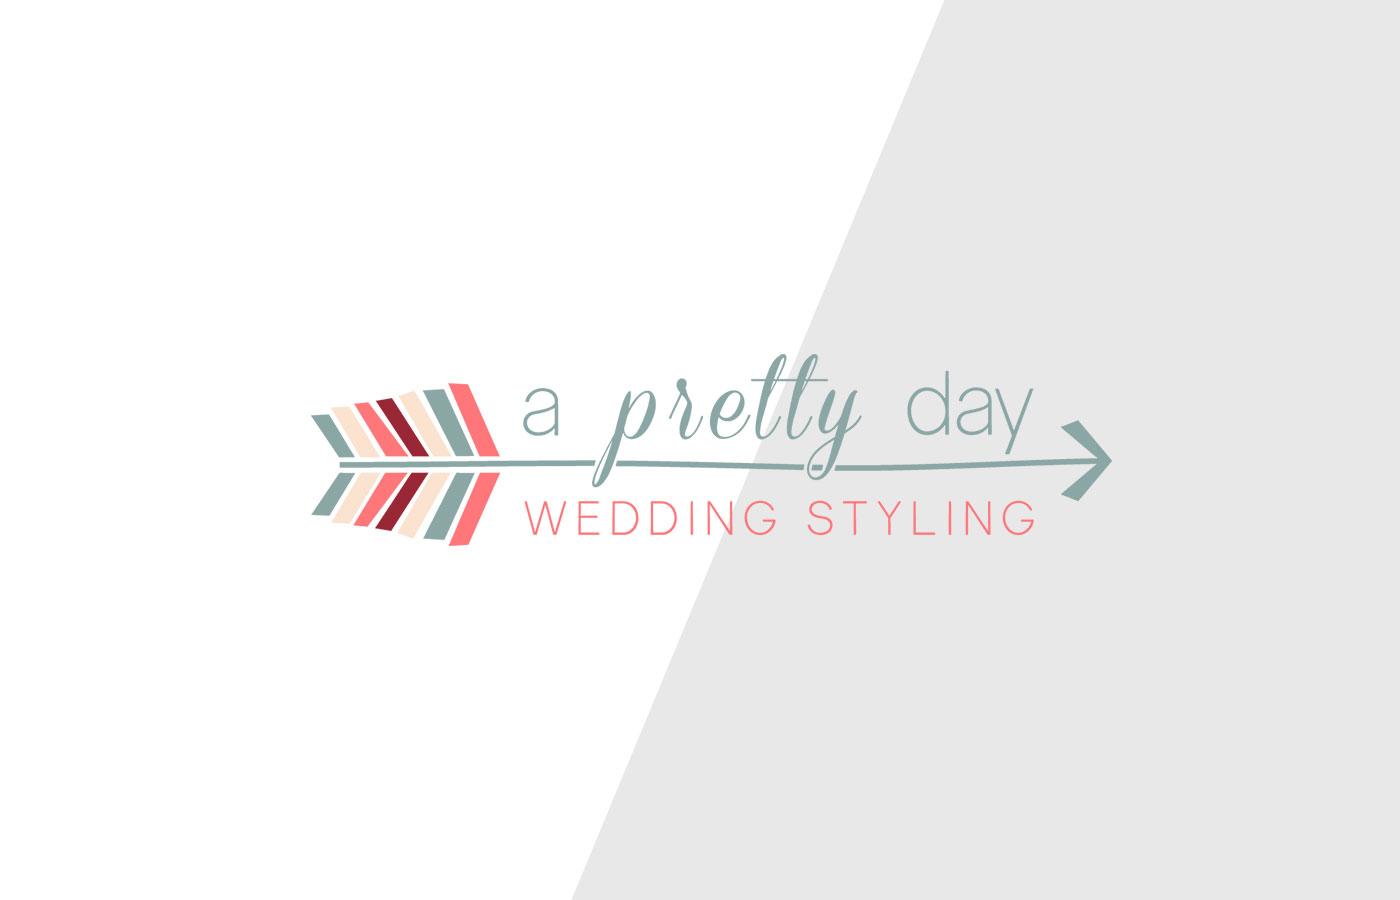 logo a pretty day